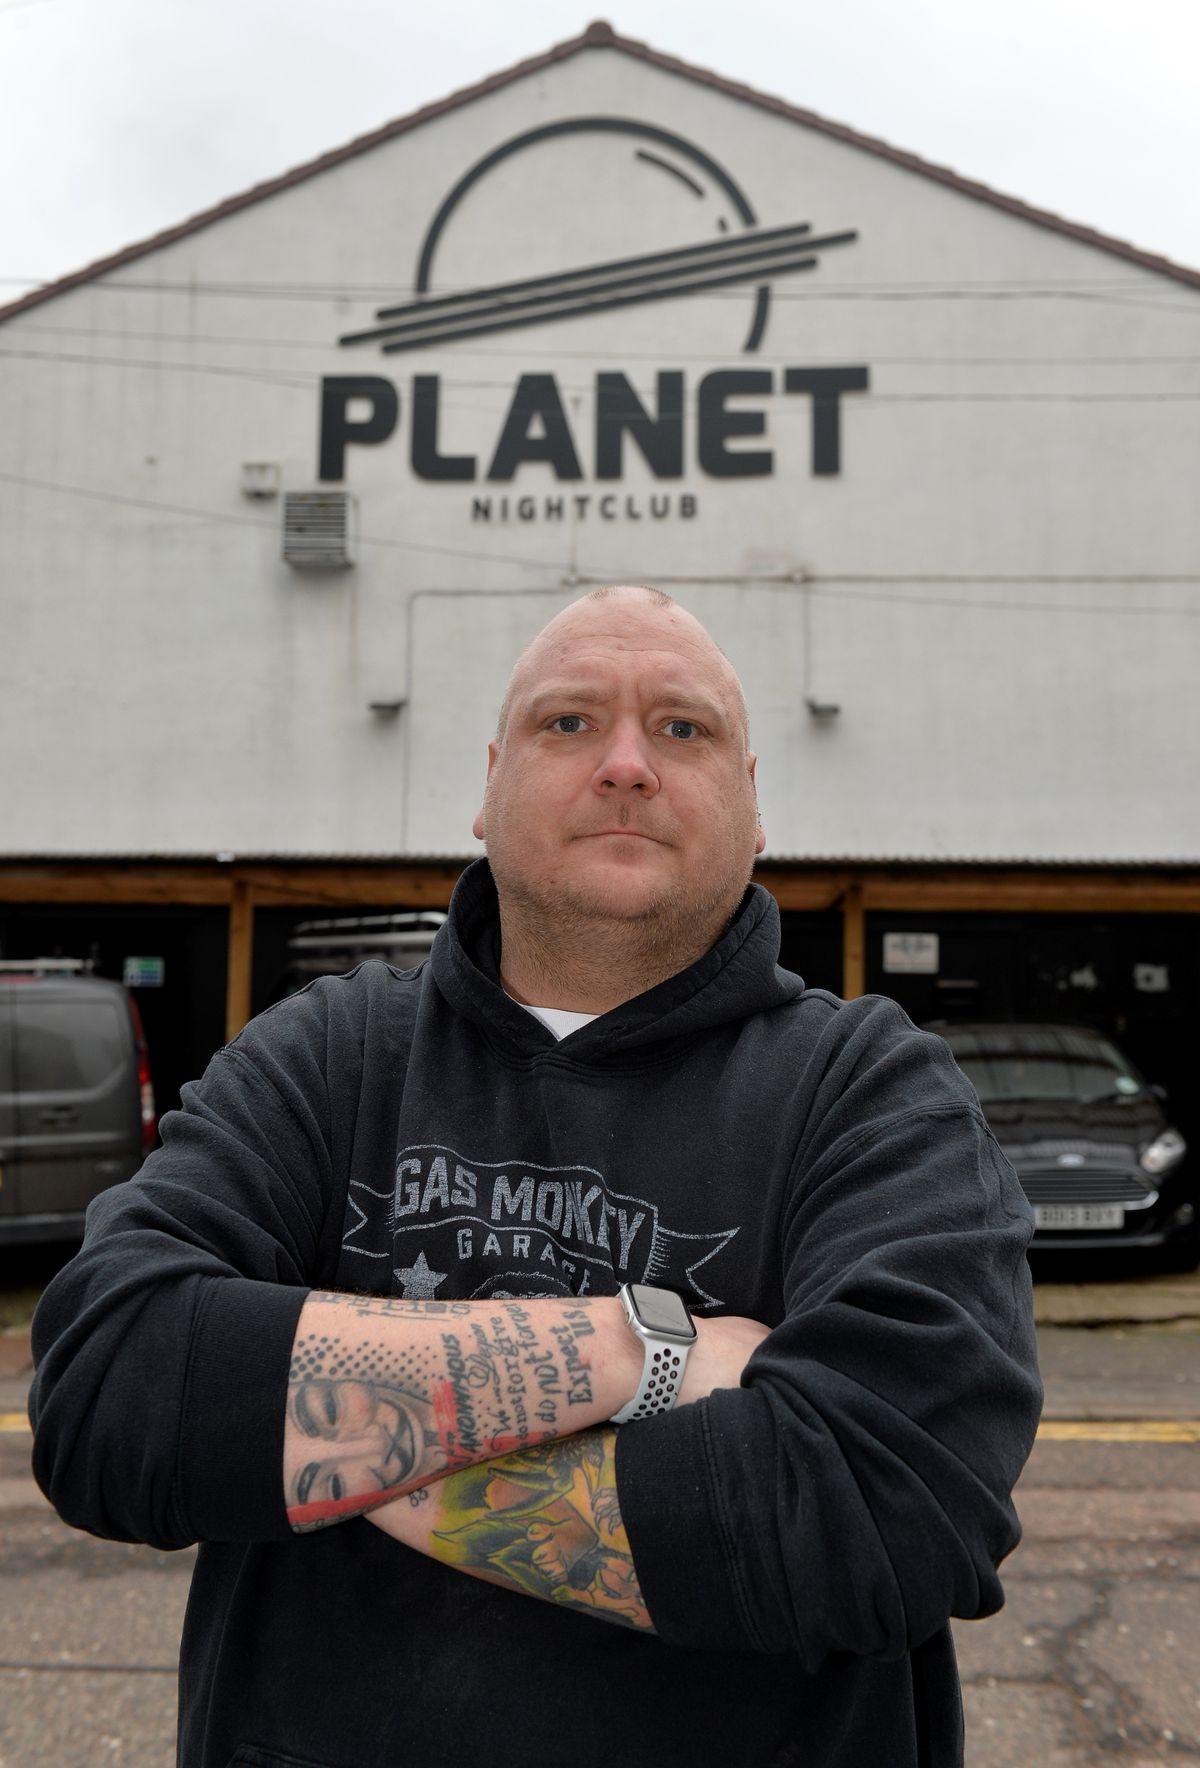 Michael Ansell outside his Planet Nightclub